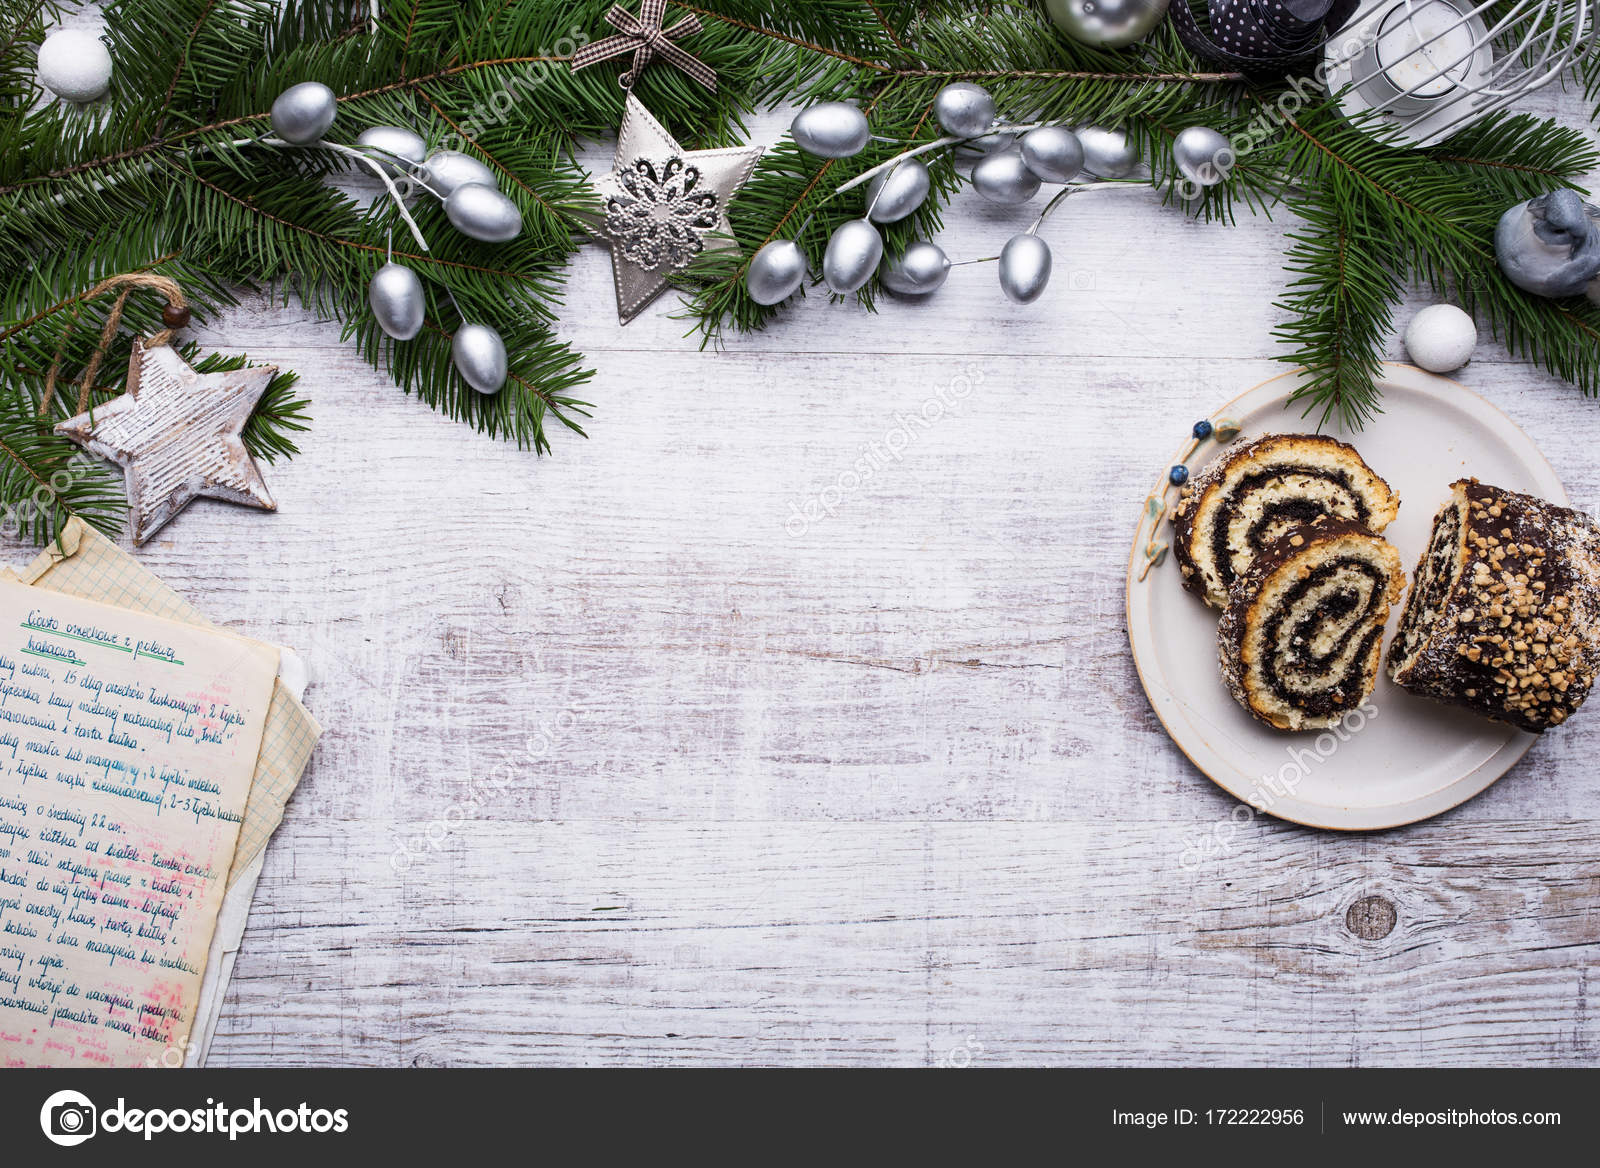 Decoraci n de navidad sobre fondo de madera foto de for Adornos navidenos 2017 trackid sp 006